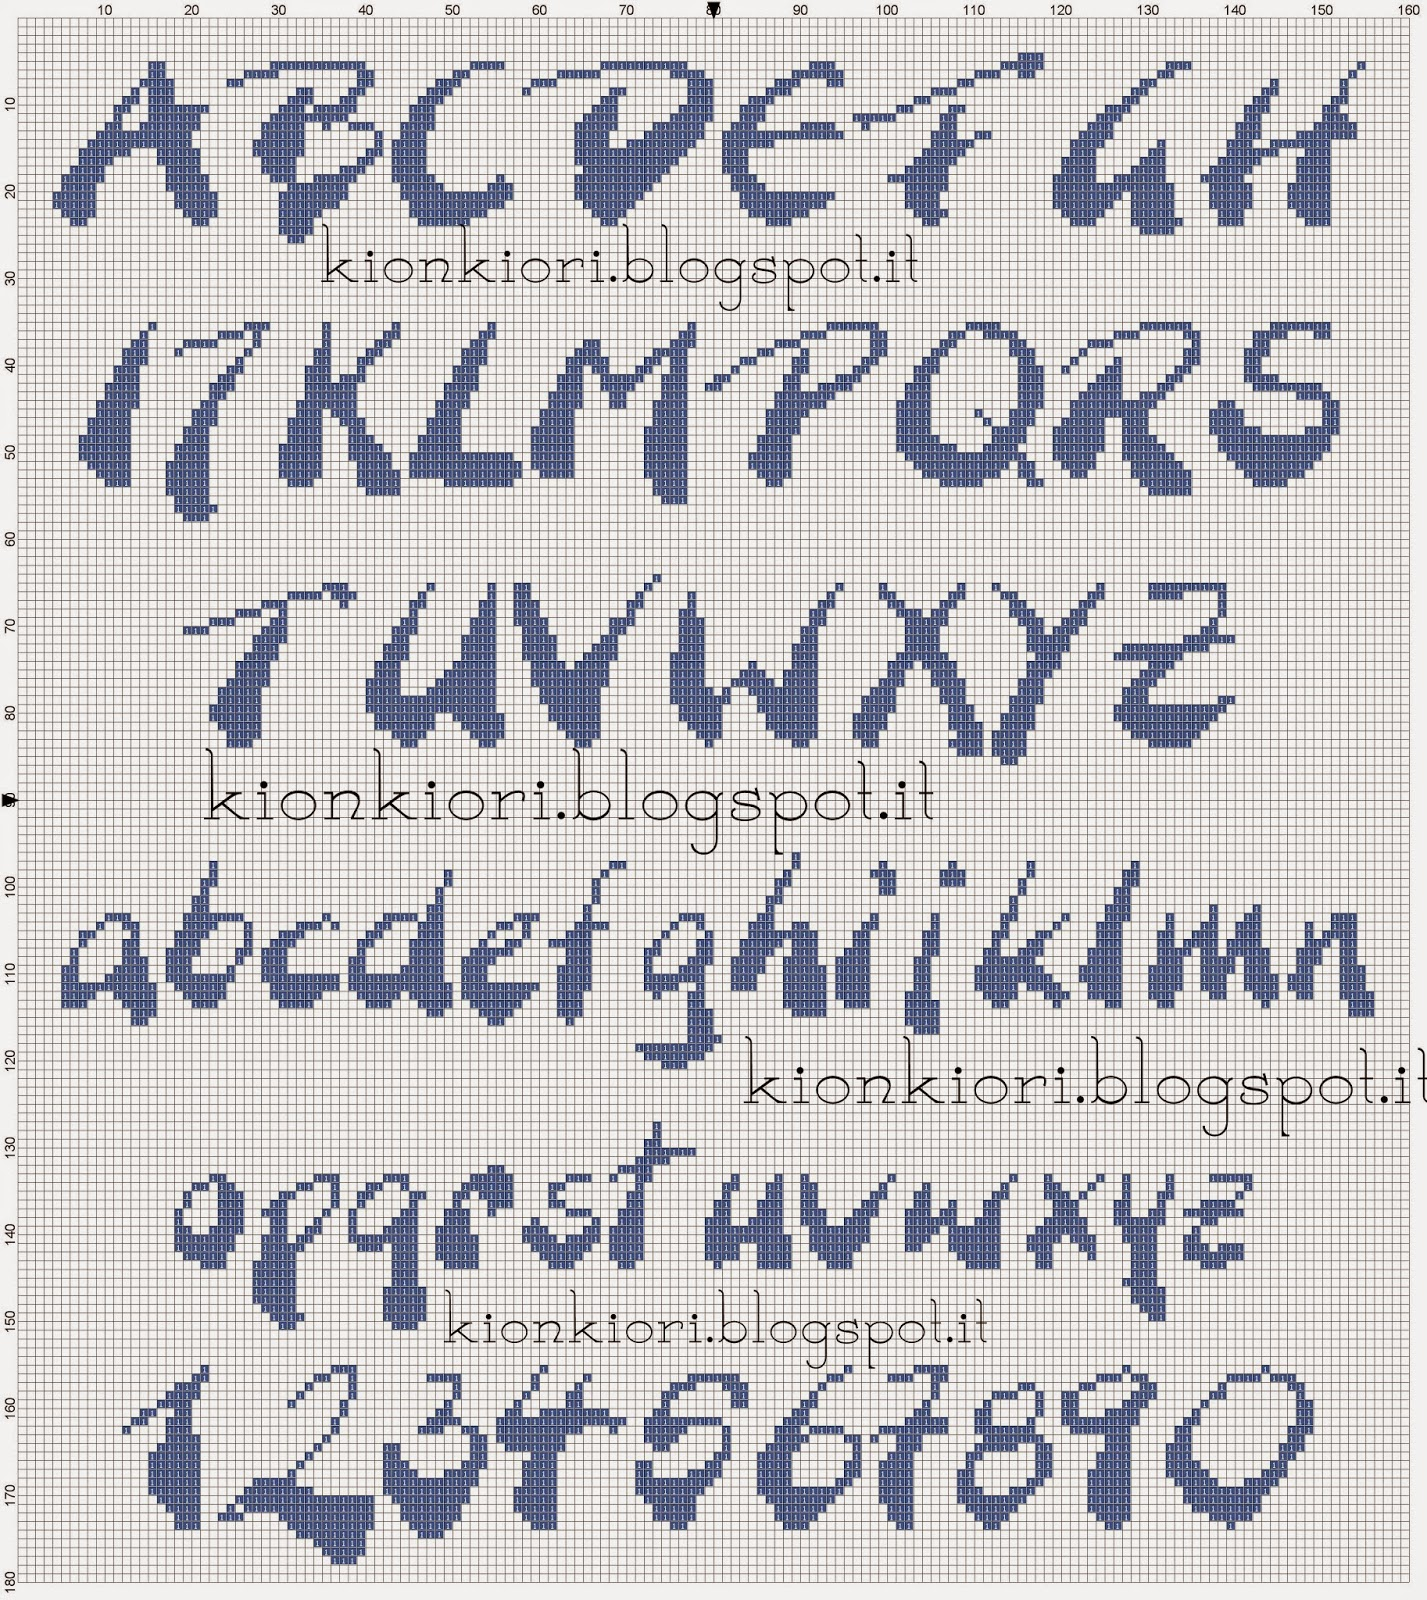 kionkiori punto croce un due tre alfabeti